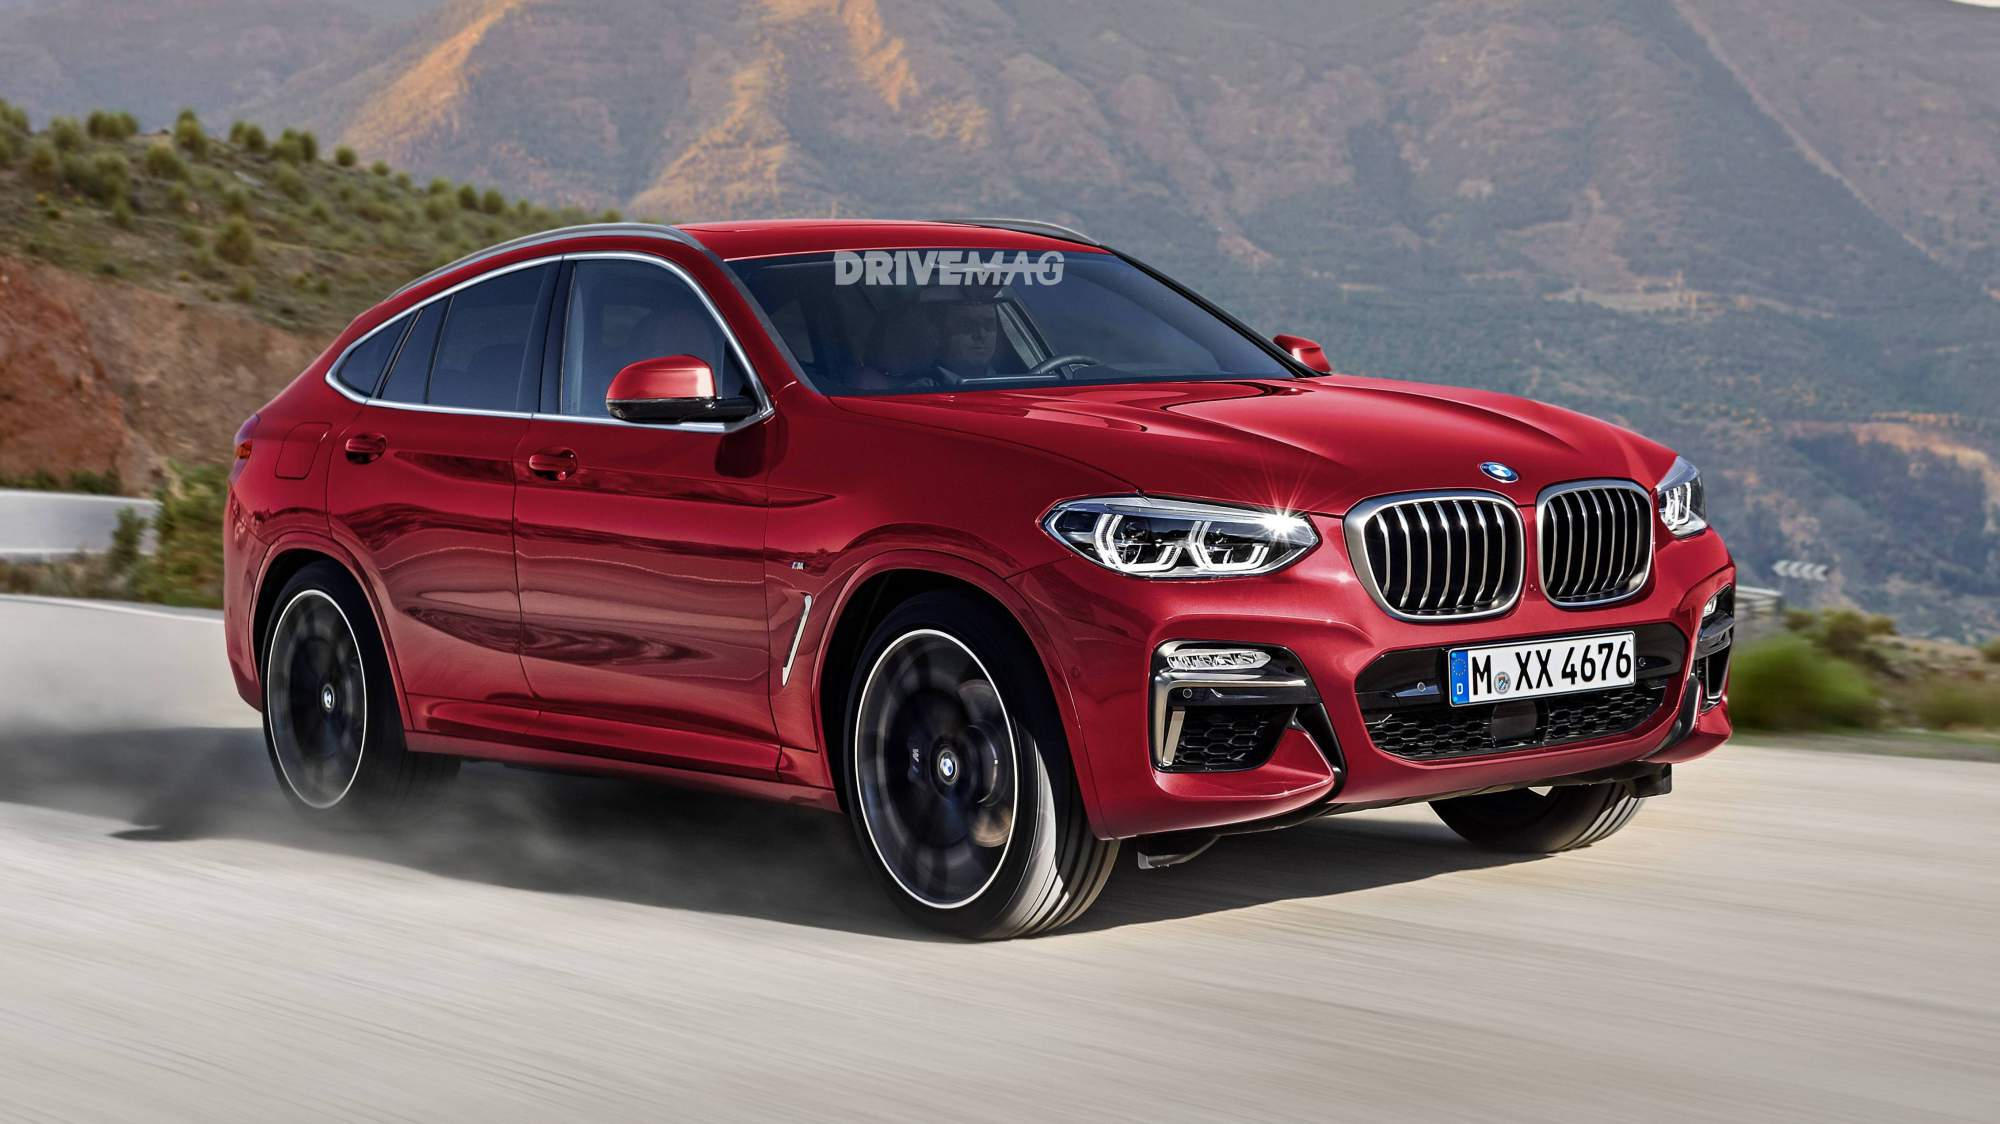 Takšen bo izjemno čudovit, novi BMW X4 M40i!BMWBLOG | BMWBLOG